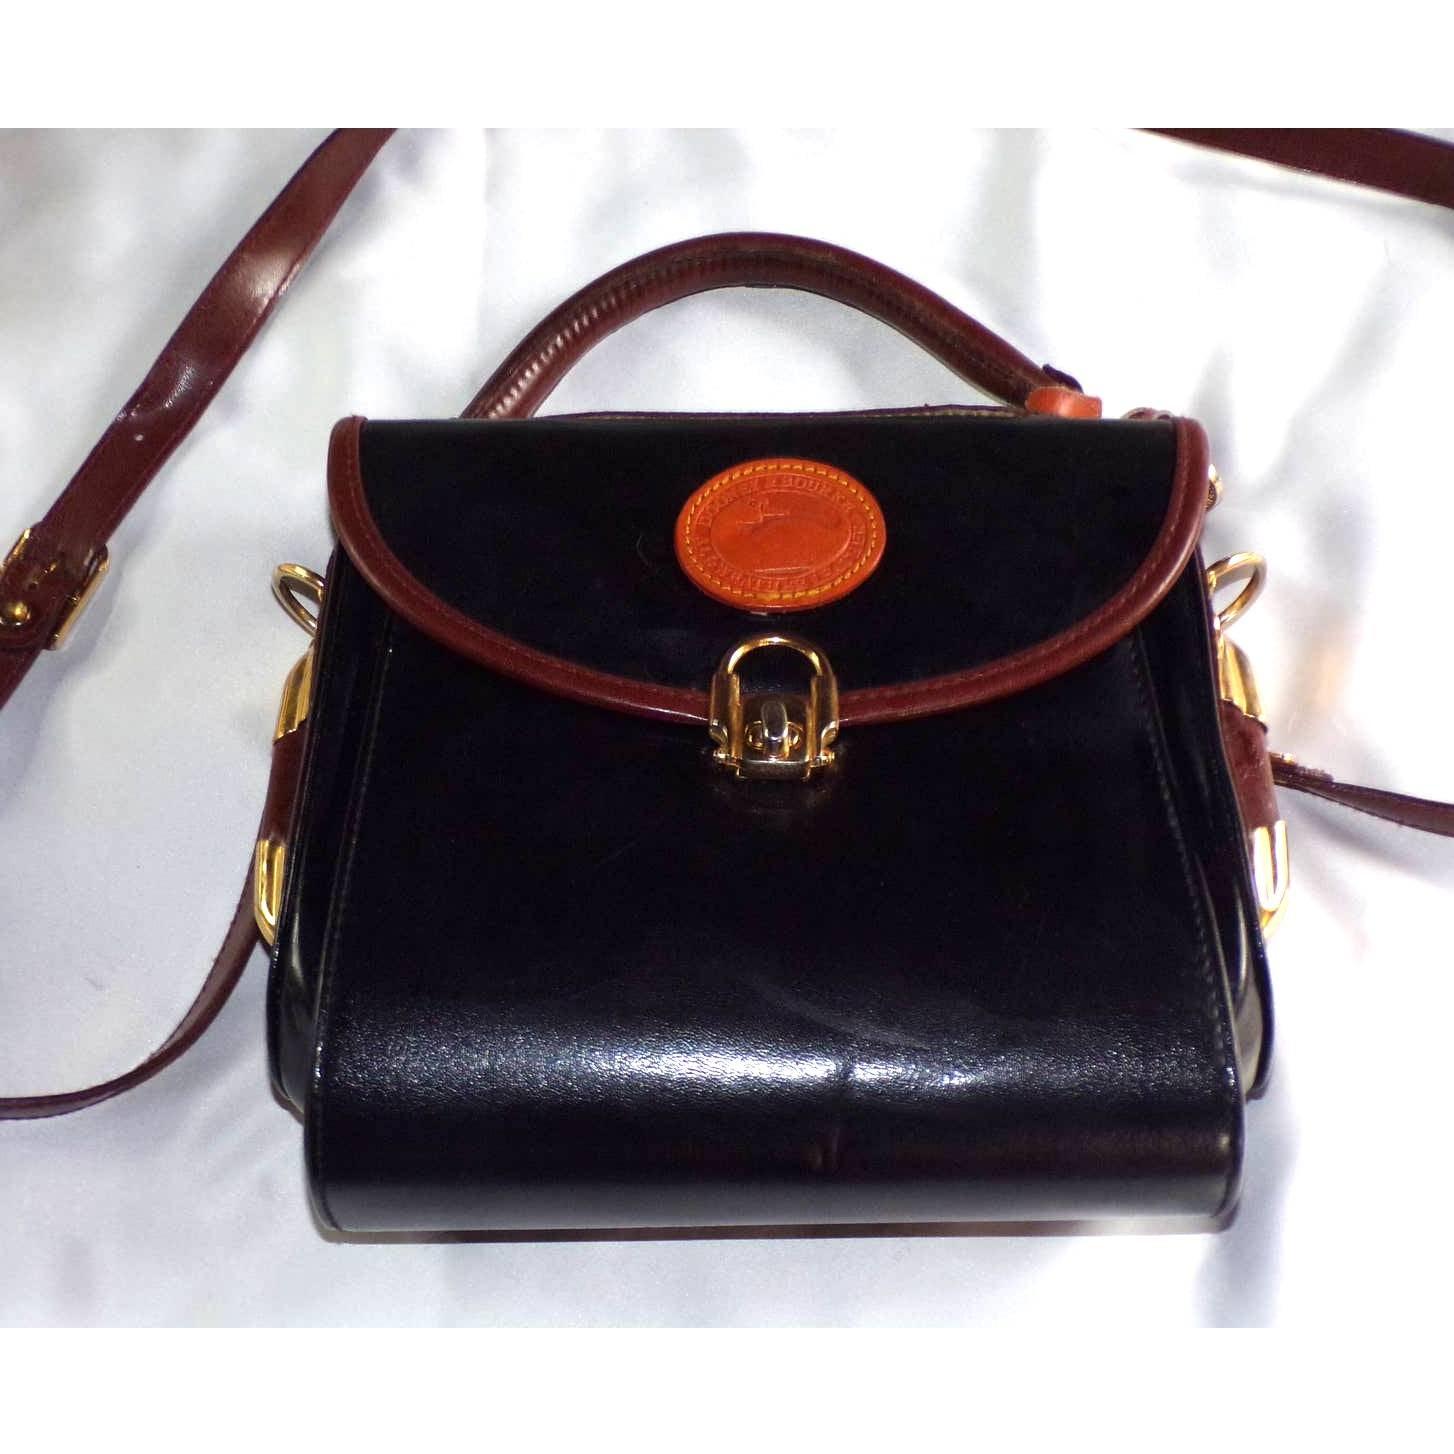 Dooney & Bourke Handbags Vintage Leather